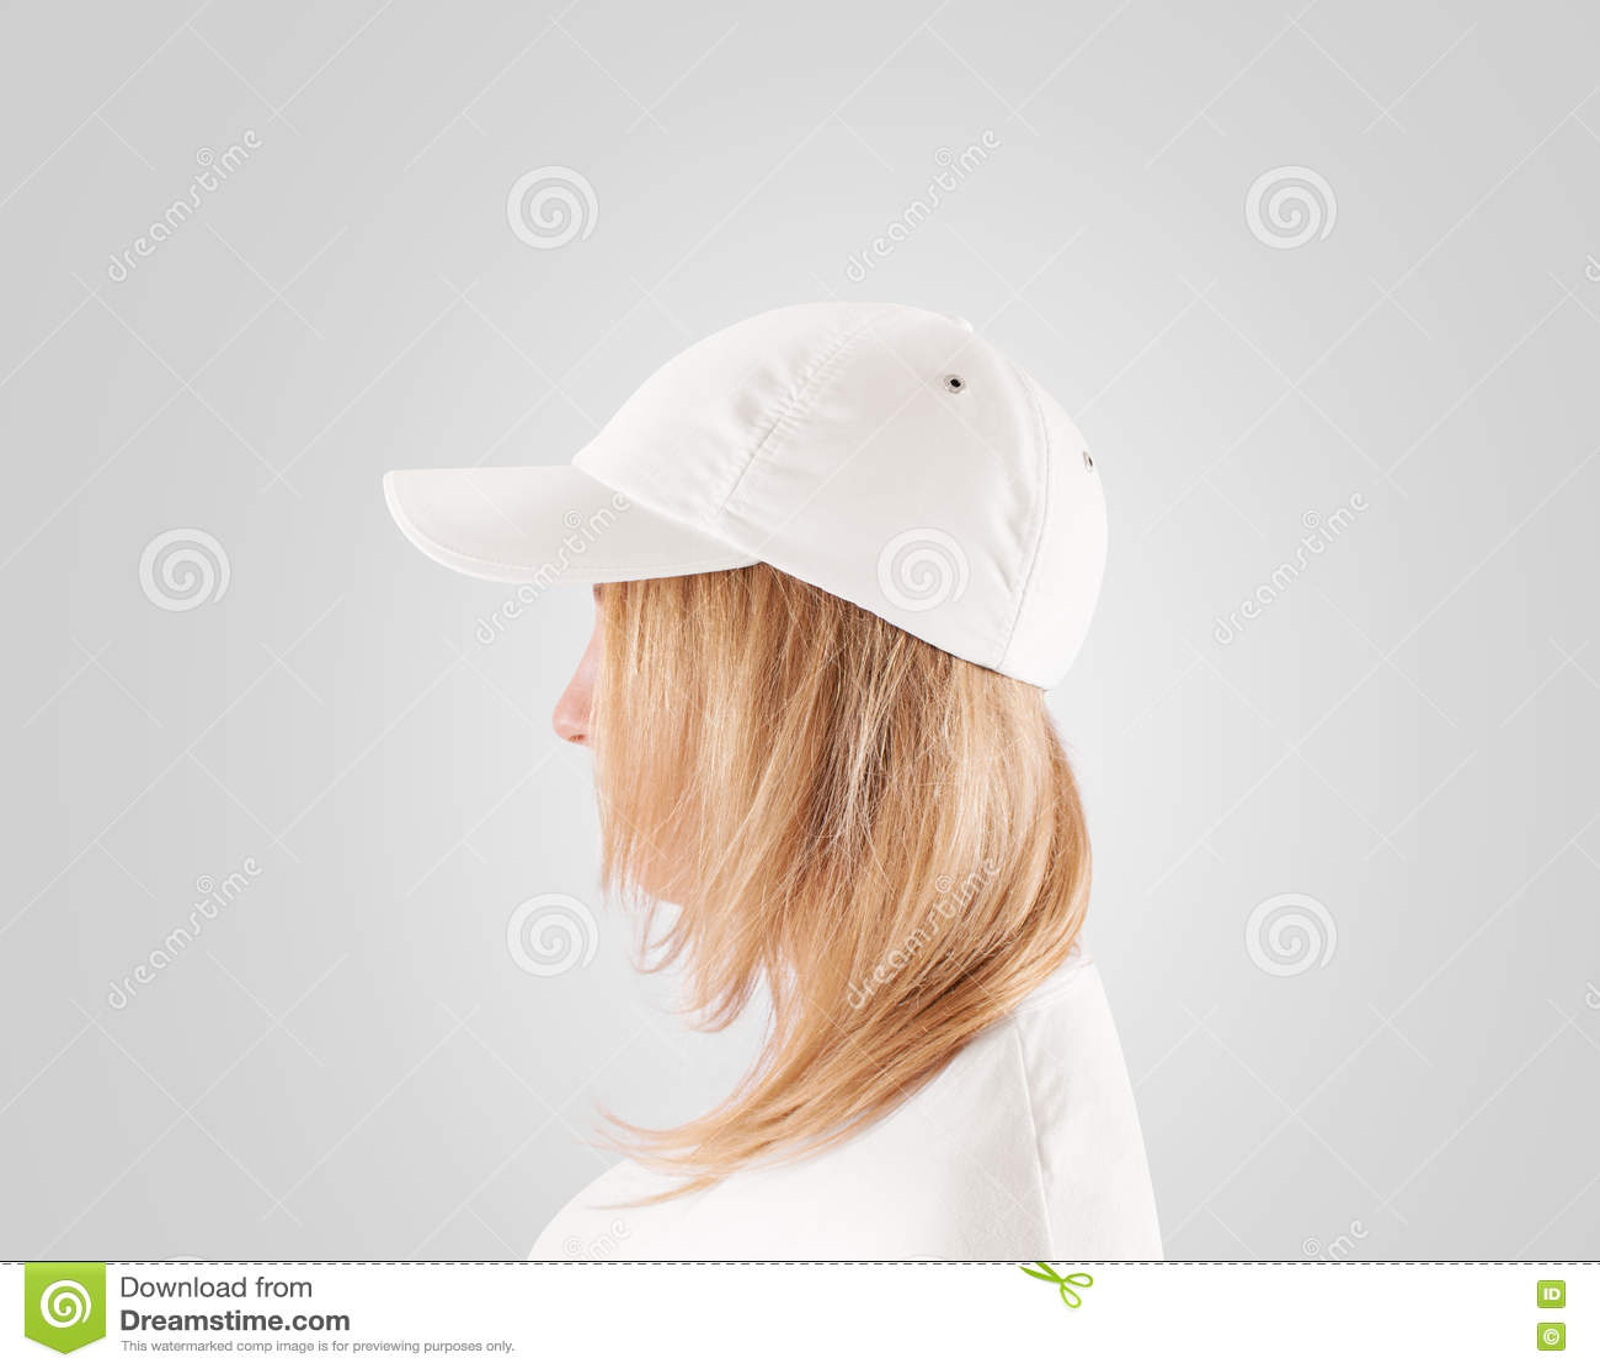 Blank White Baseball Cap Mockup Template 0392efba8c1